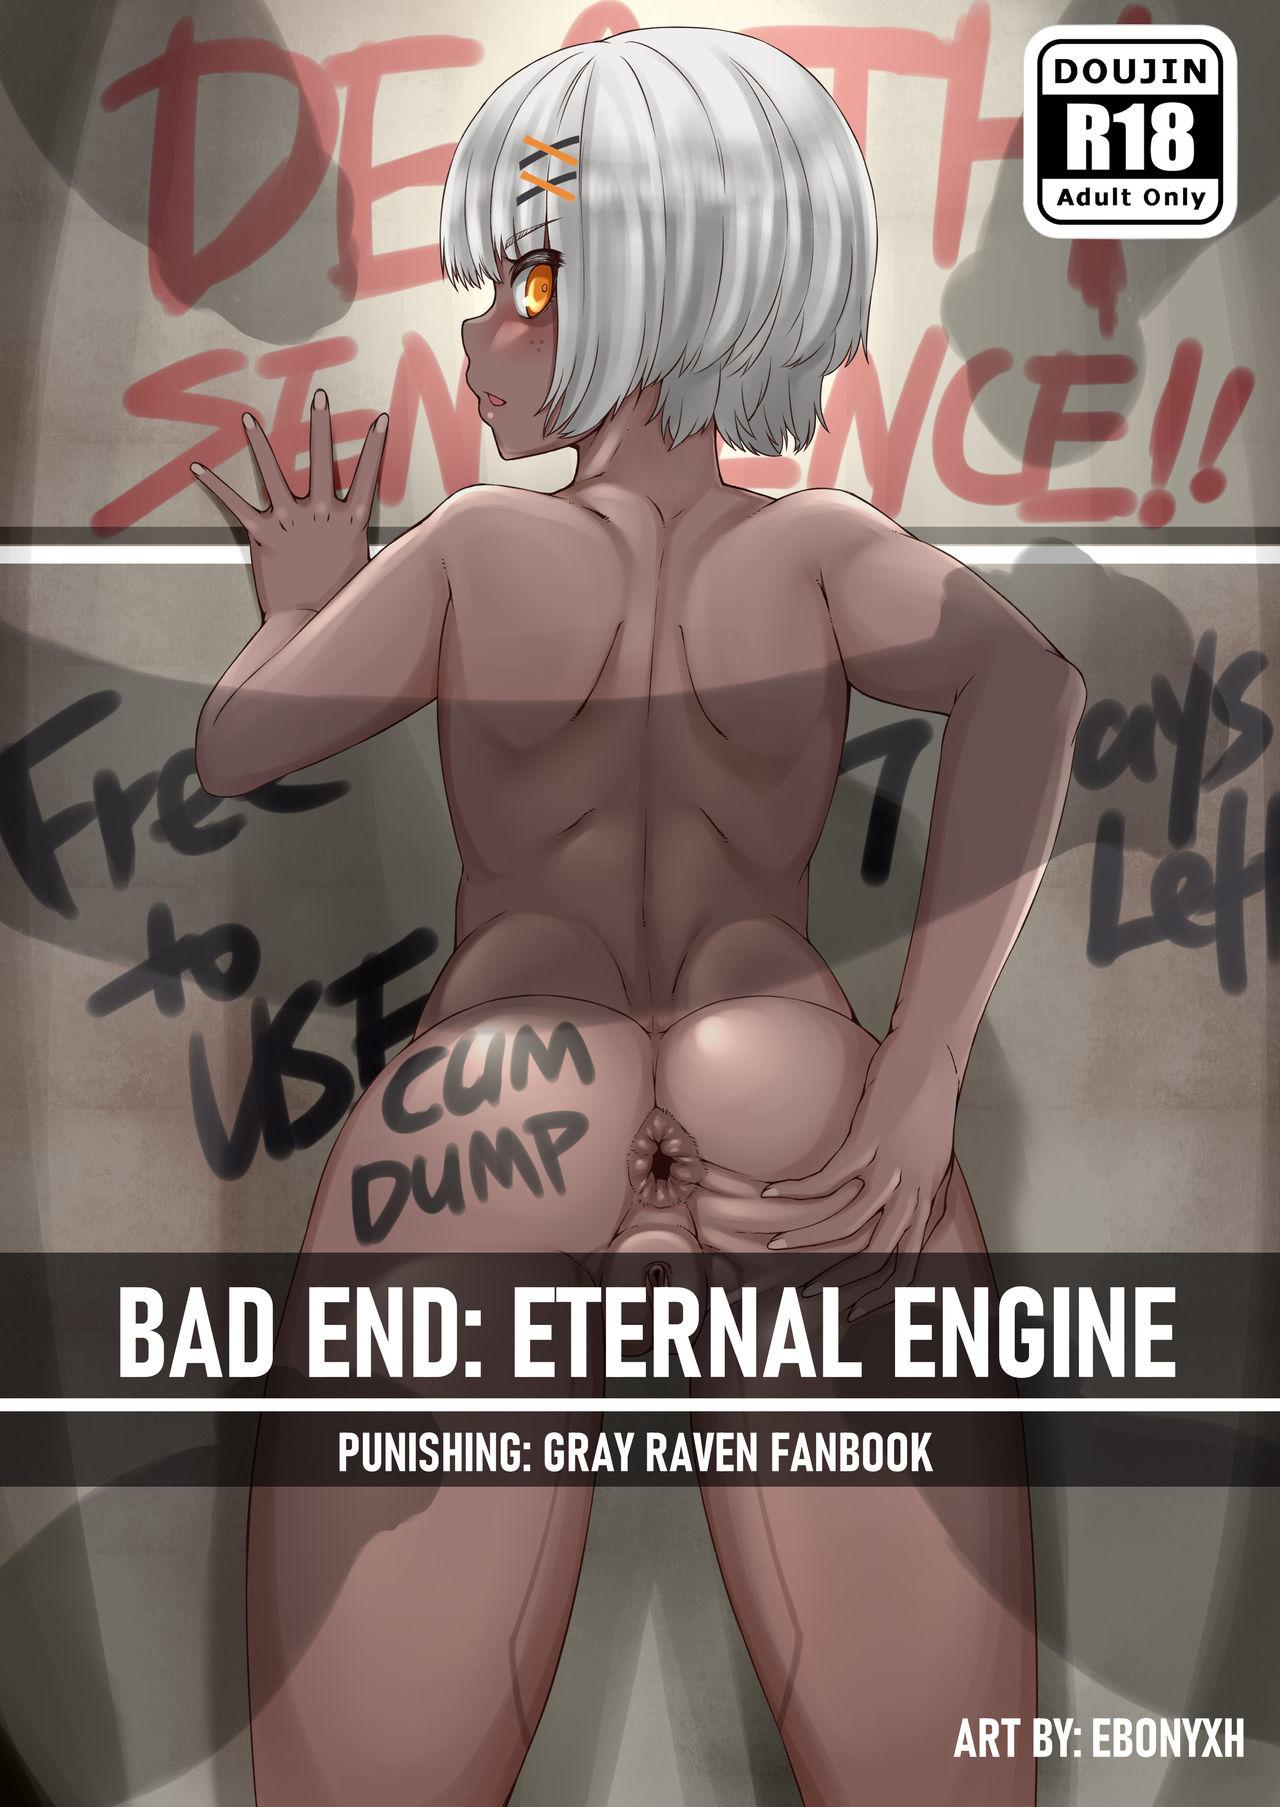 BAD END: ETERNAL ENGINE 0